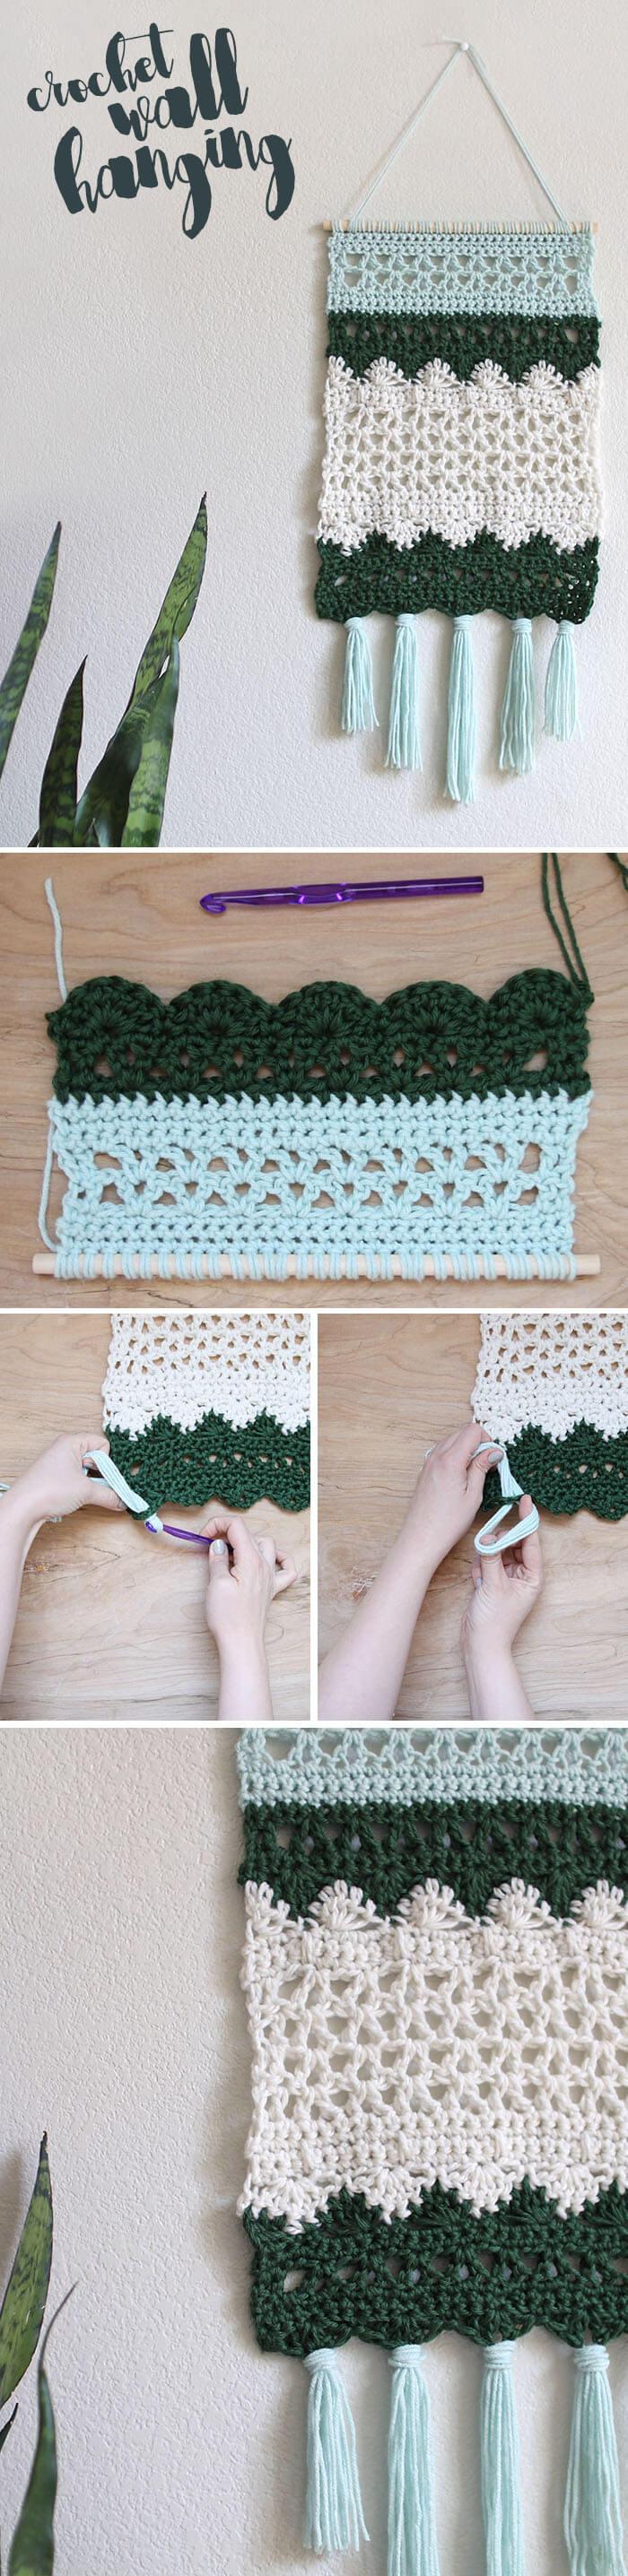 Crochet wall hanging pattern persia lou Crochet home decor pinterest